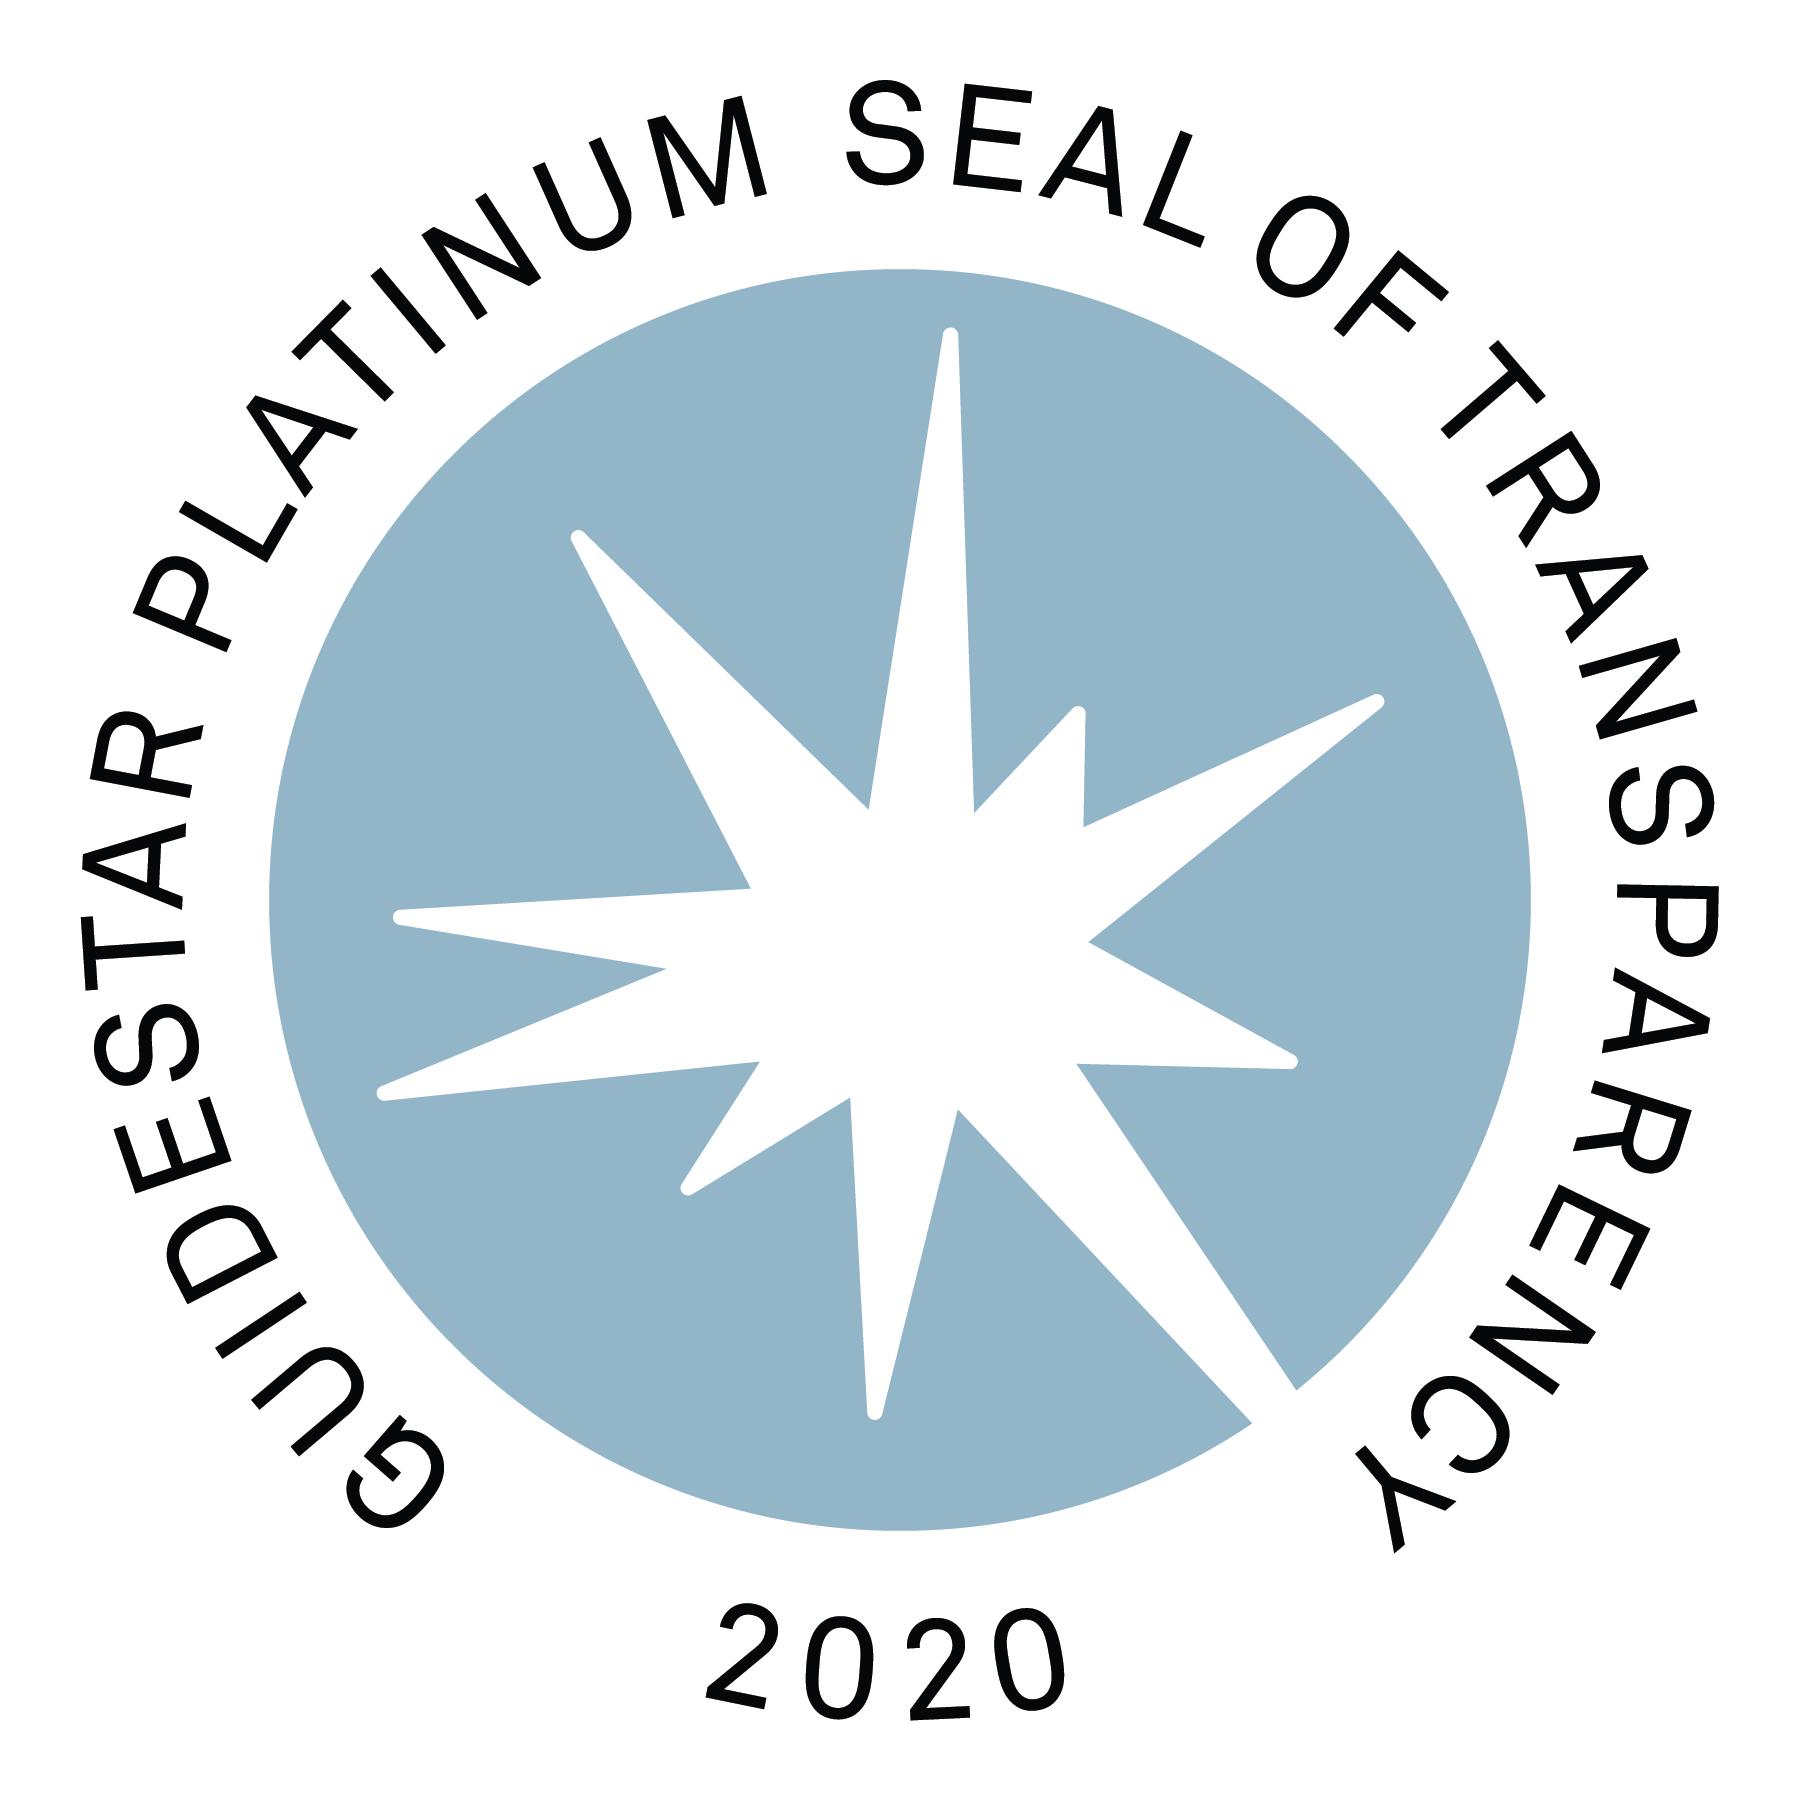 Guidestar Platinum-Seal of Transparency 2020